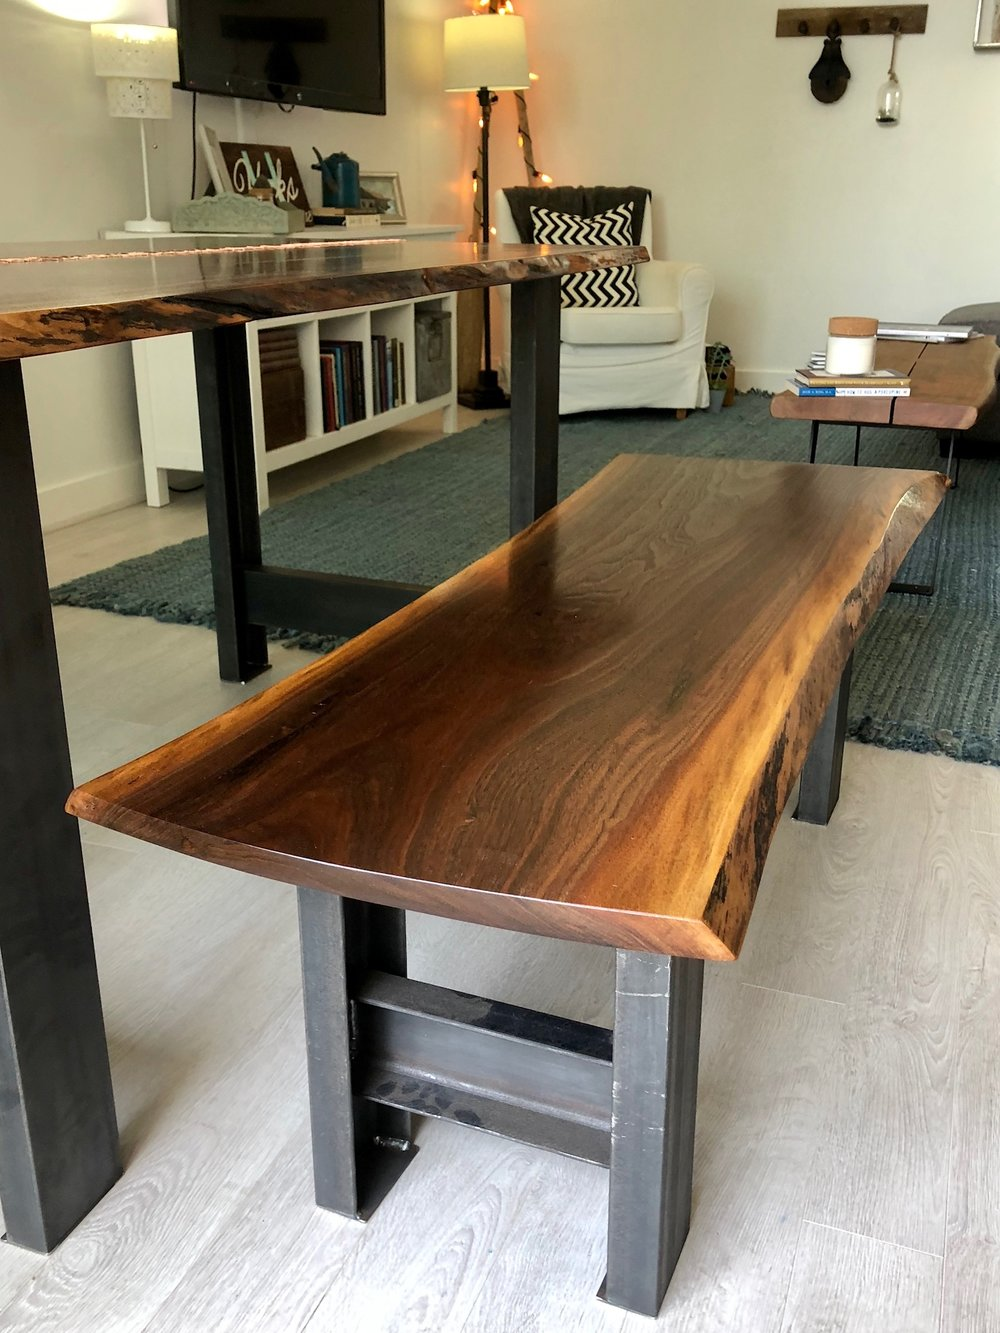 live edge walnut copper laced kitchen table with live edge walnut bench mid century modern furniture Sallie Plumley Studio Richmond Virginia Sally Plumley Custom Woodworking and Furniture Design